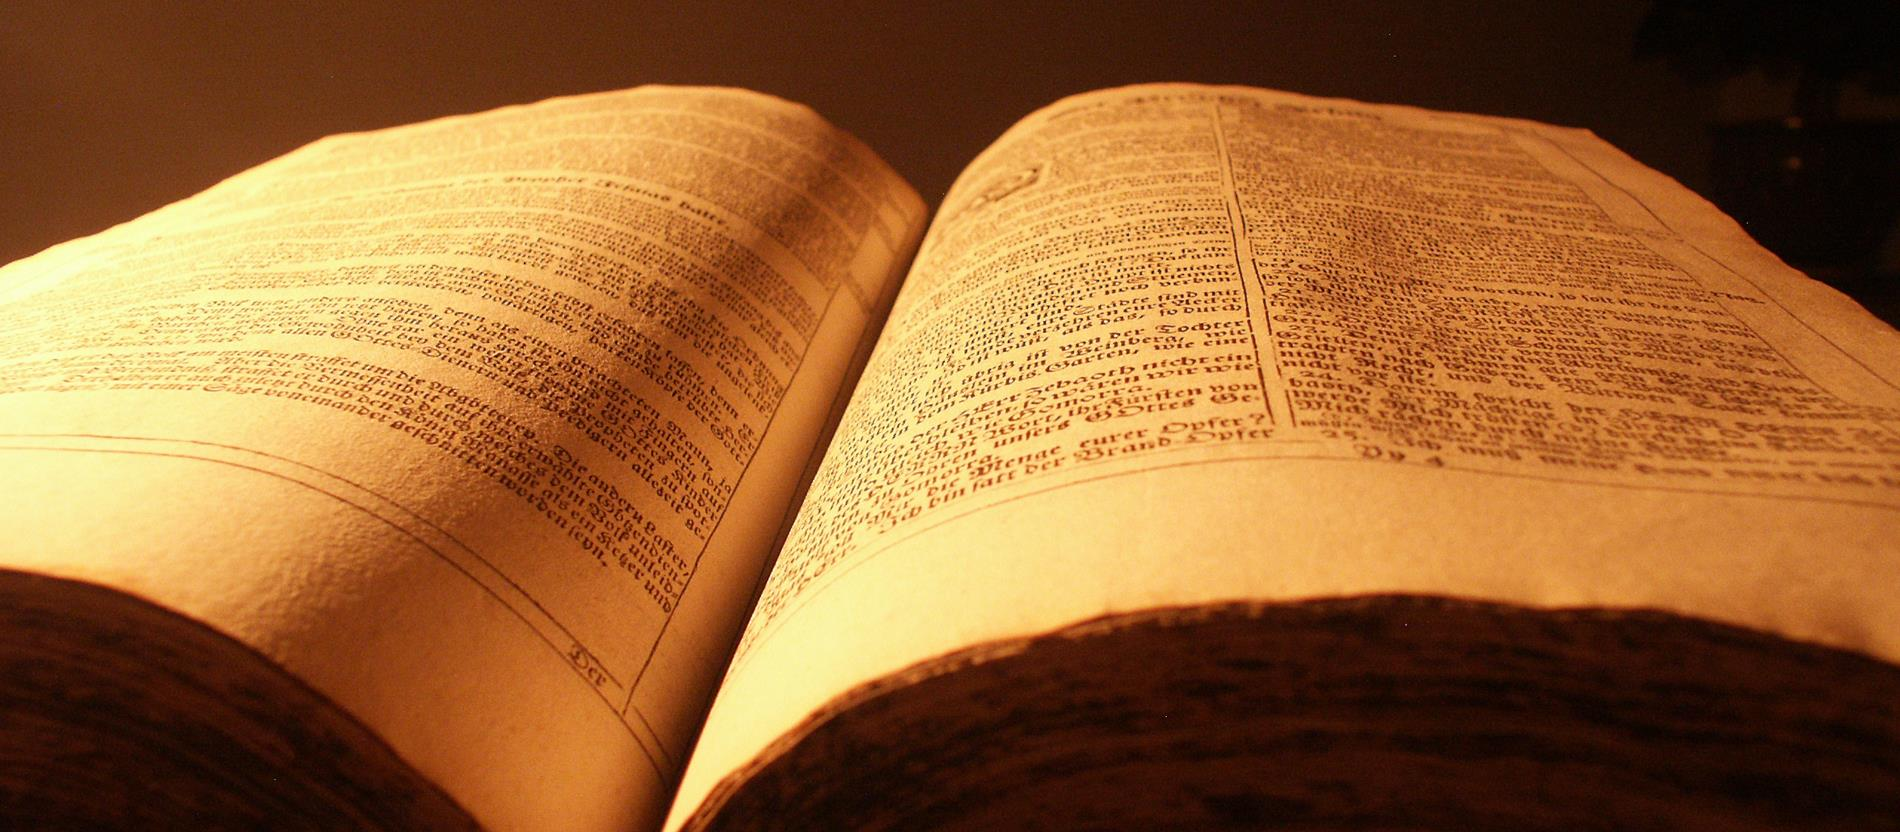 Unsere Bibel